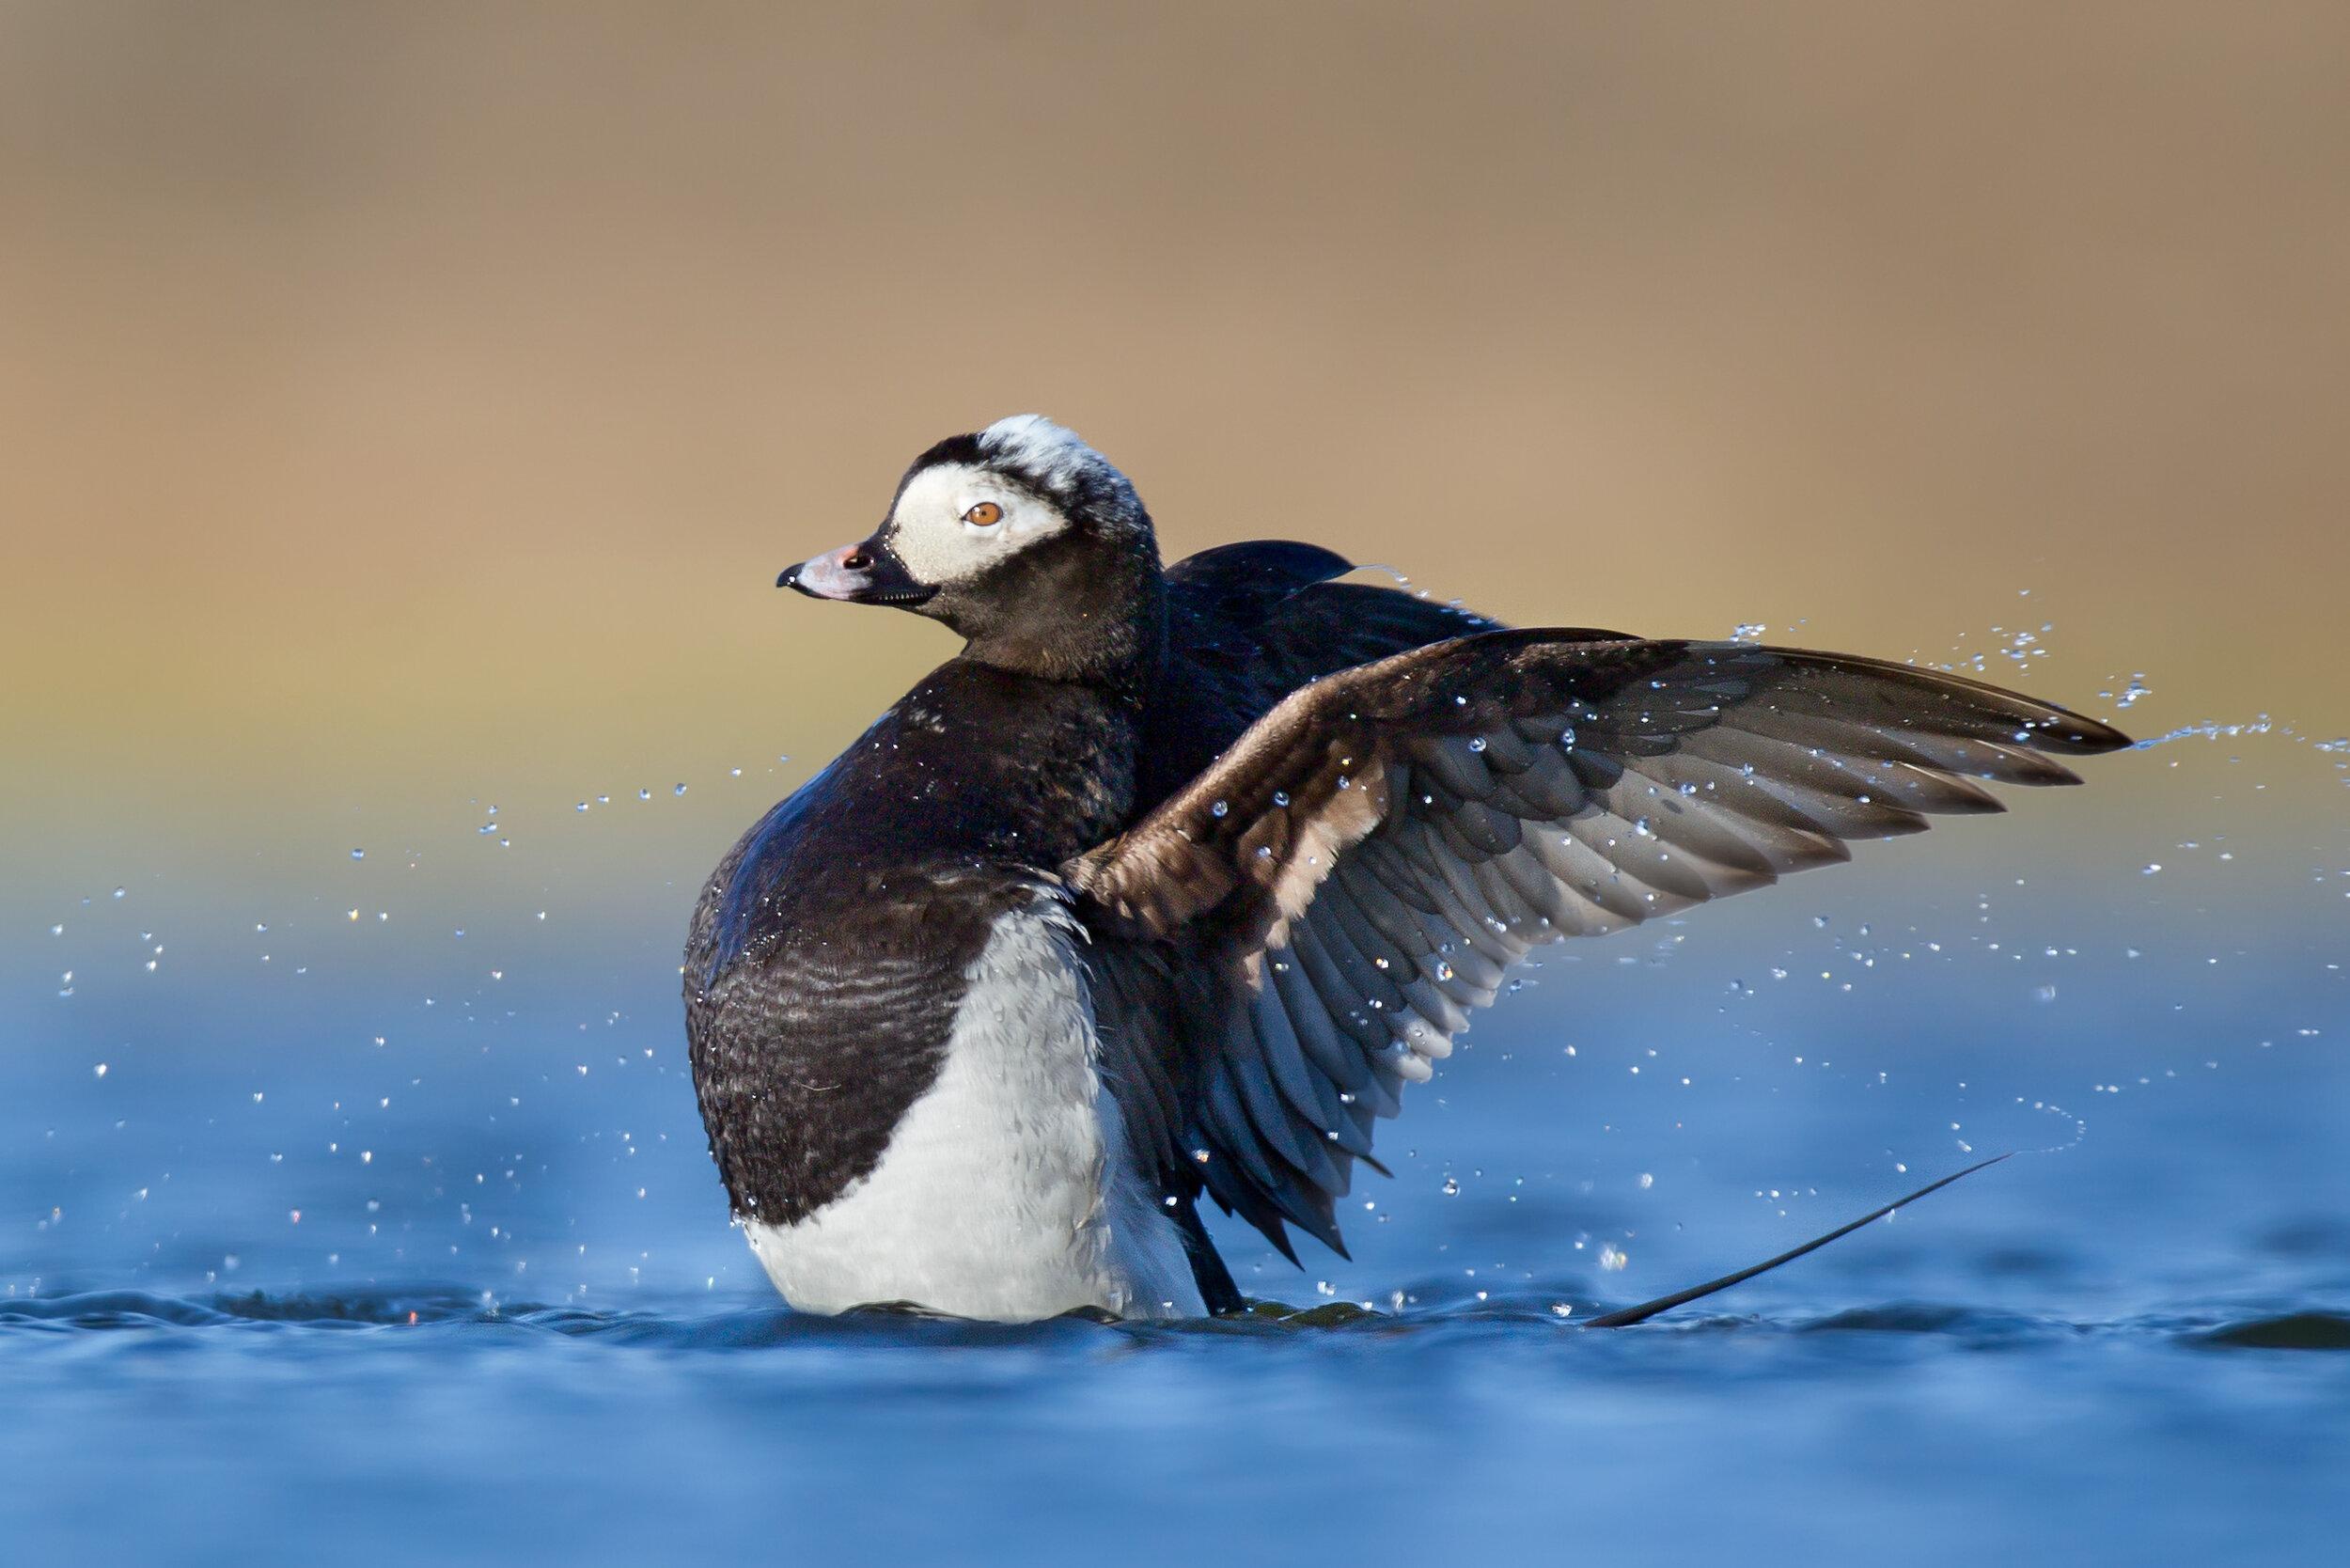 long-tailed_duck_00391931c.jpg